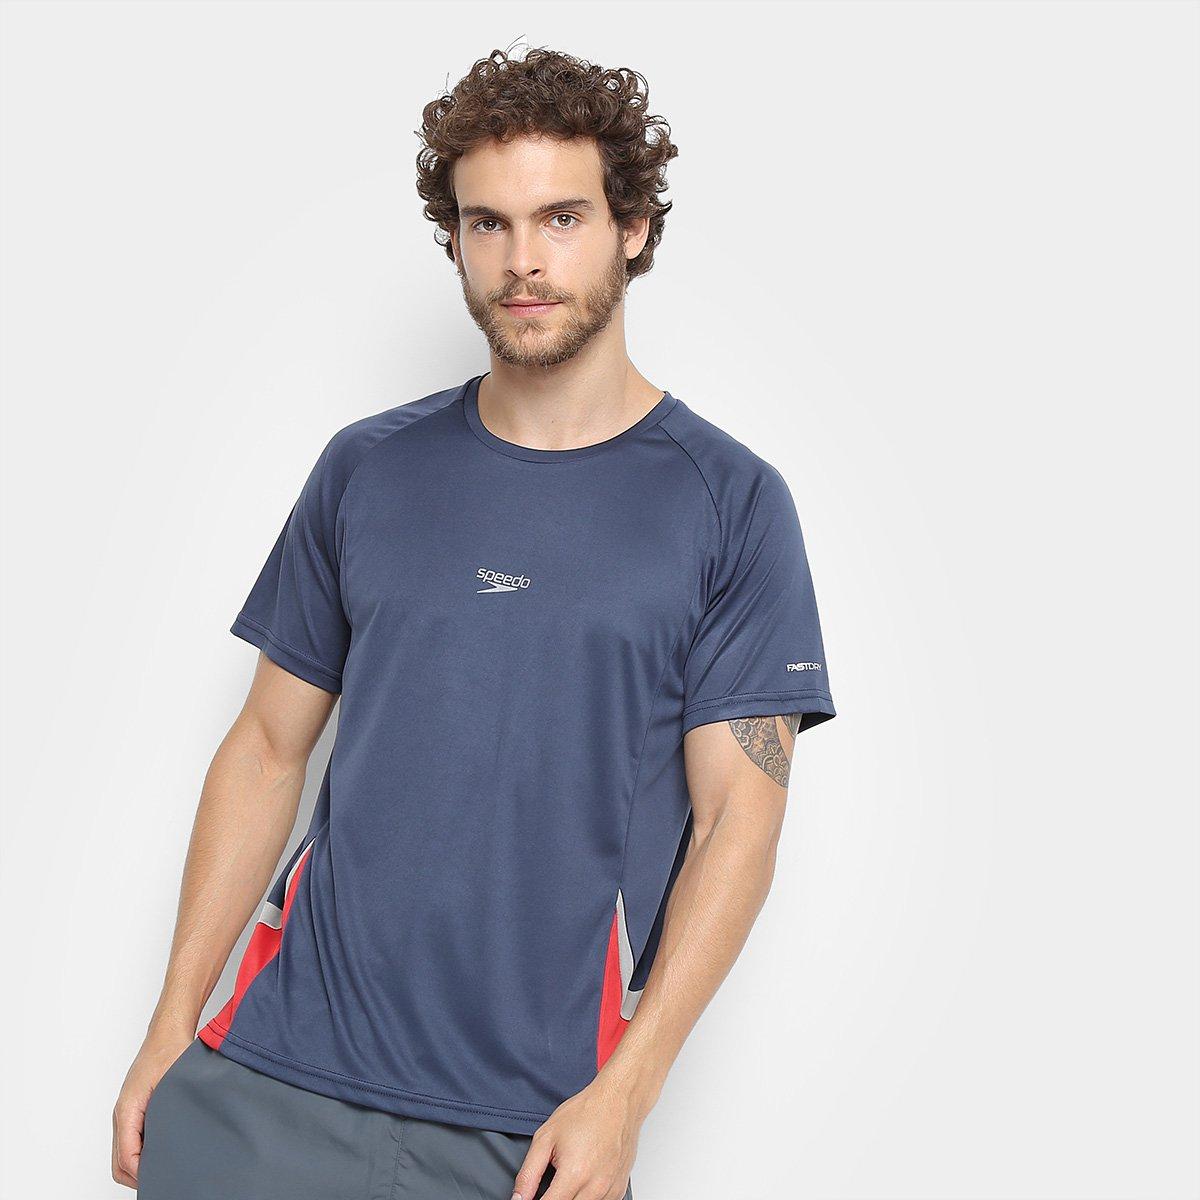 Camiseta Speedo Line Masculina